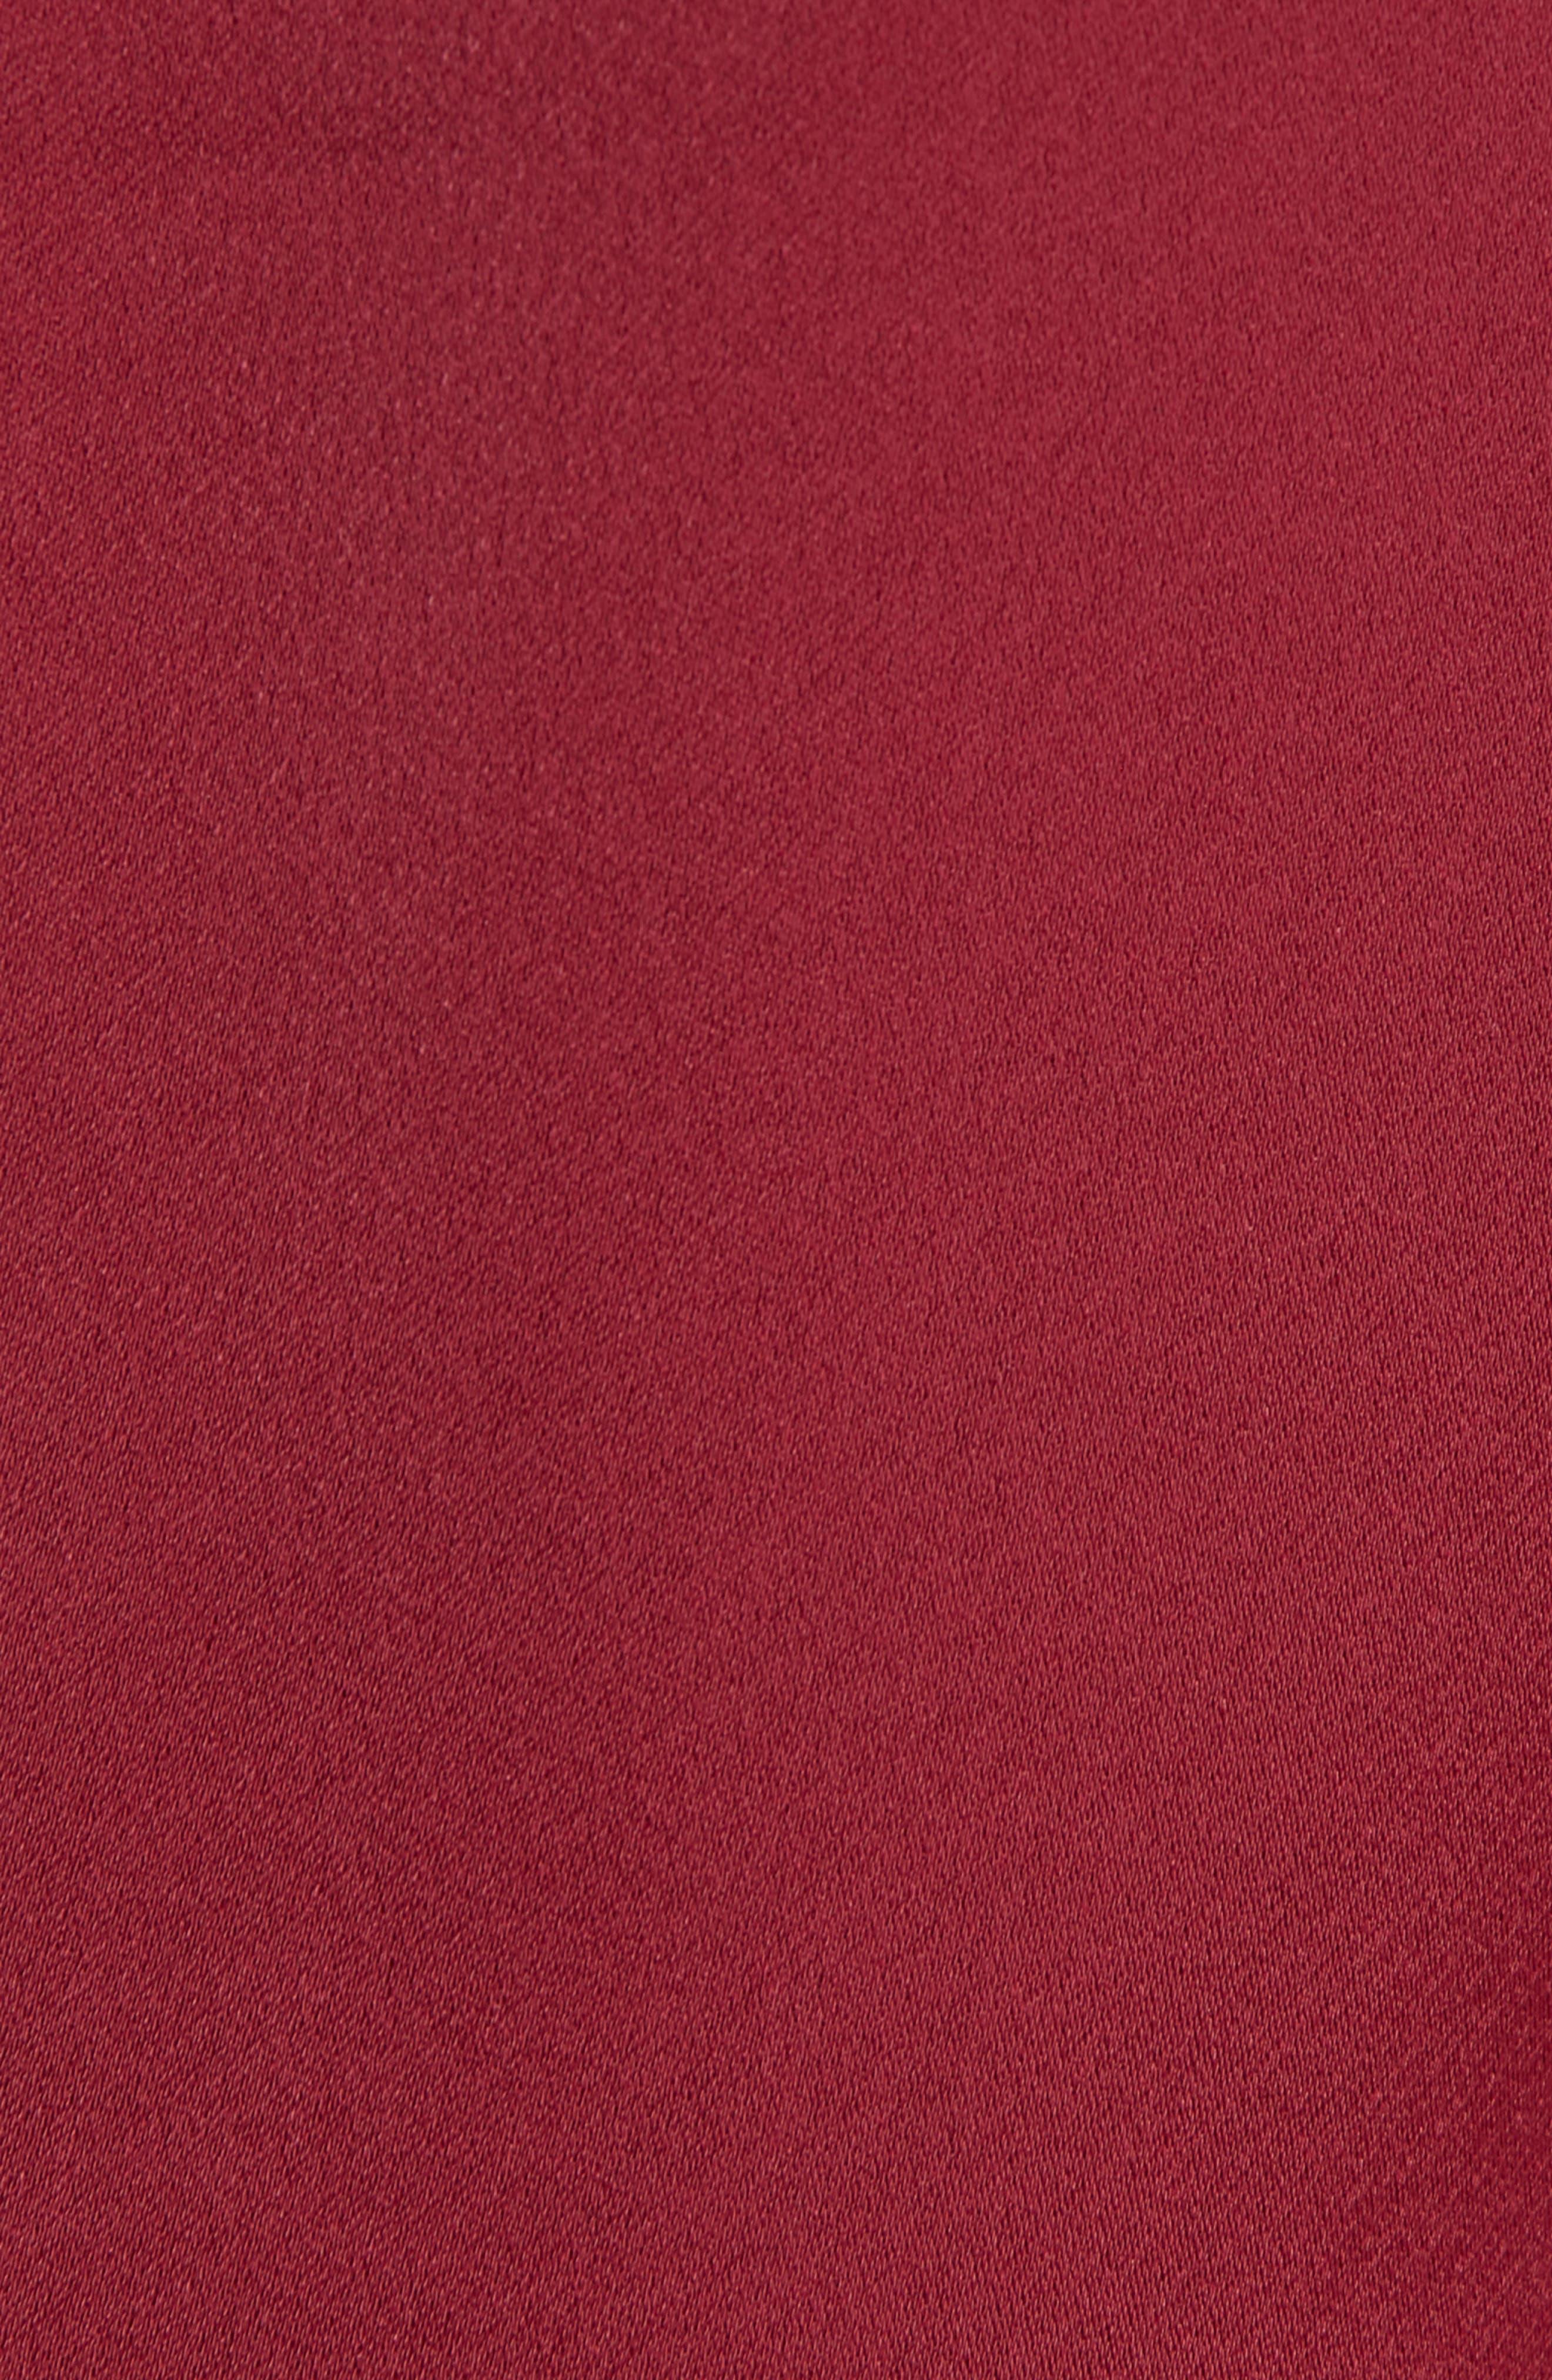 TED BAKER LONDON, Juudy Embellished Sleeve Blouse, Alternate thumbnail 5, color, 930